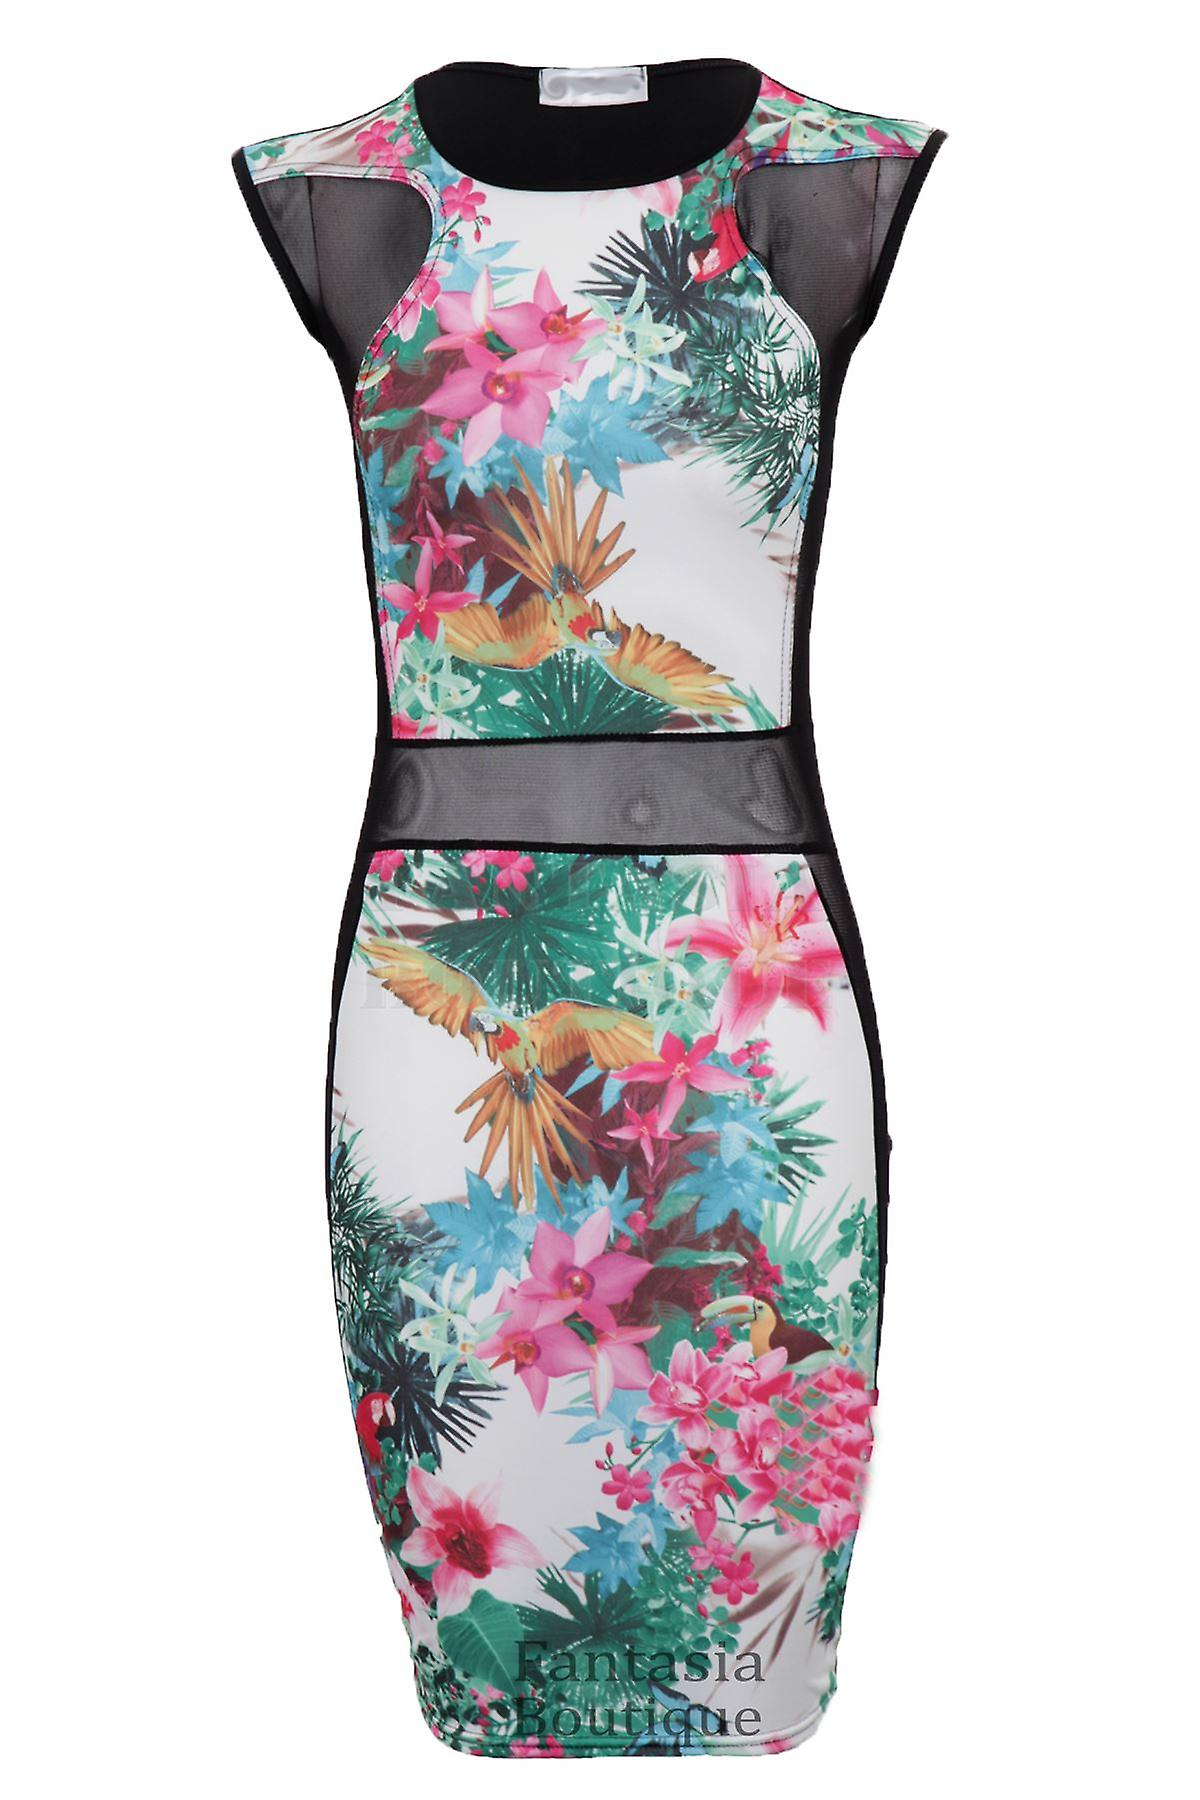 New Ladies Sleeveless Flower Print Mesh Insert Bodycon Women's Dress